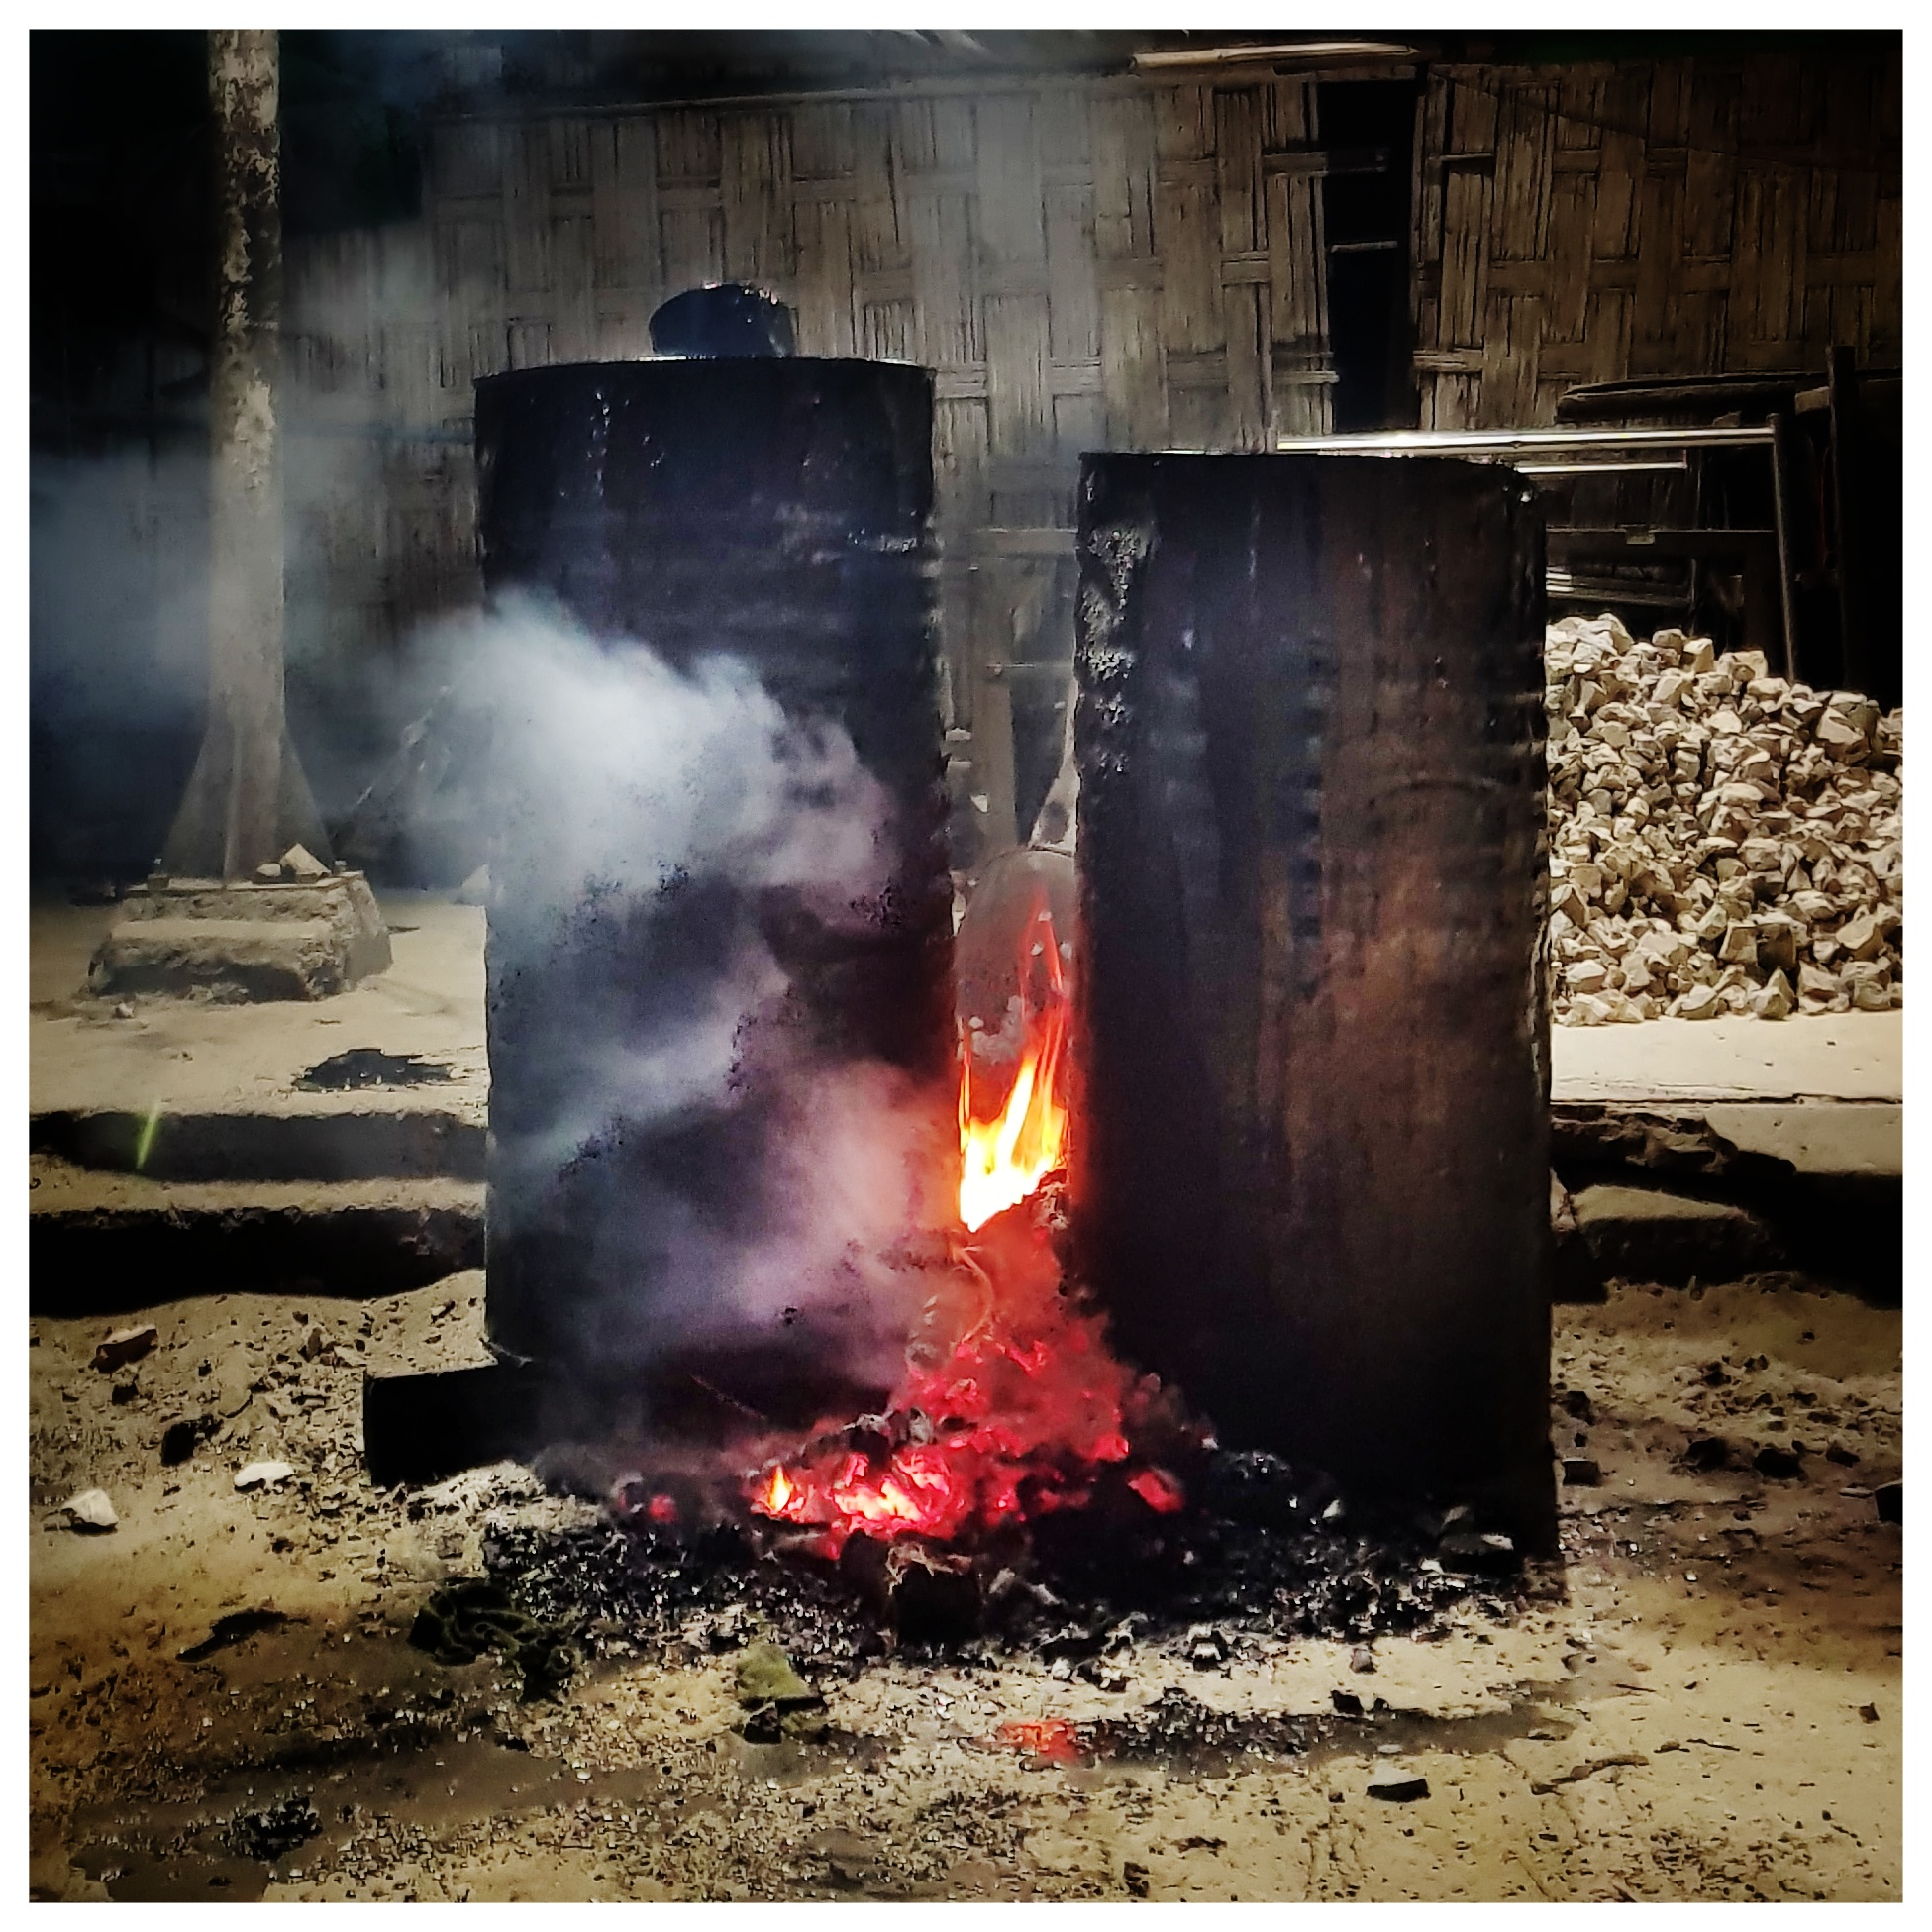 Heating the tar